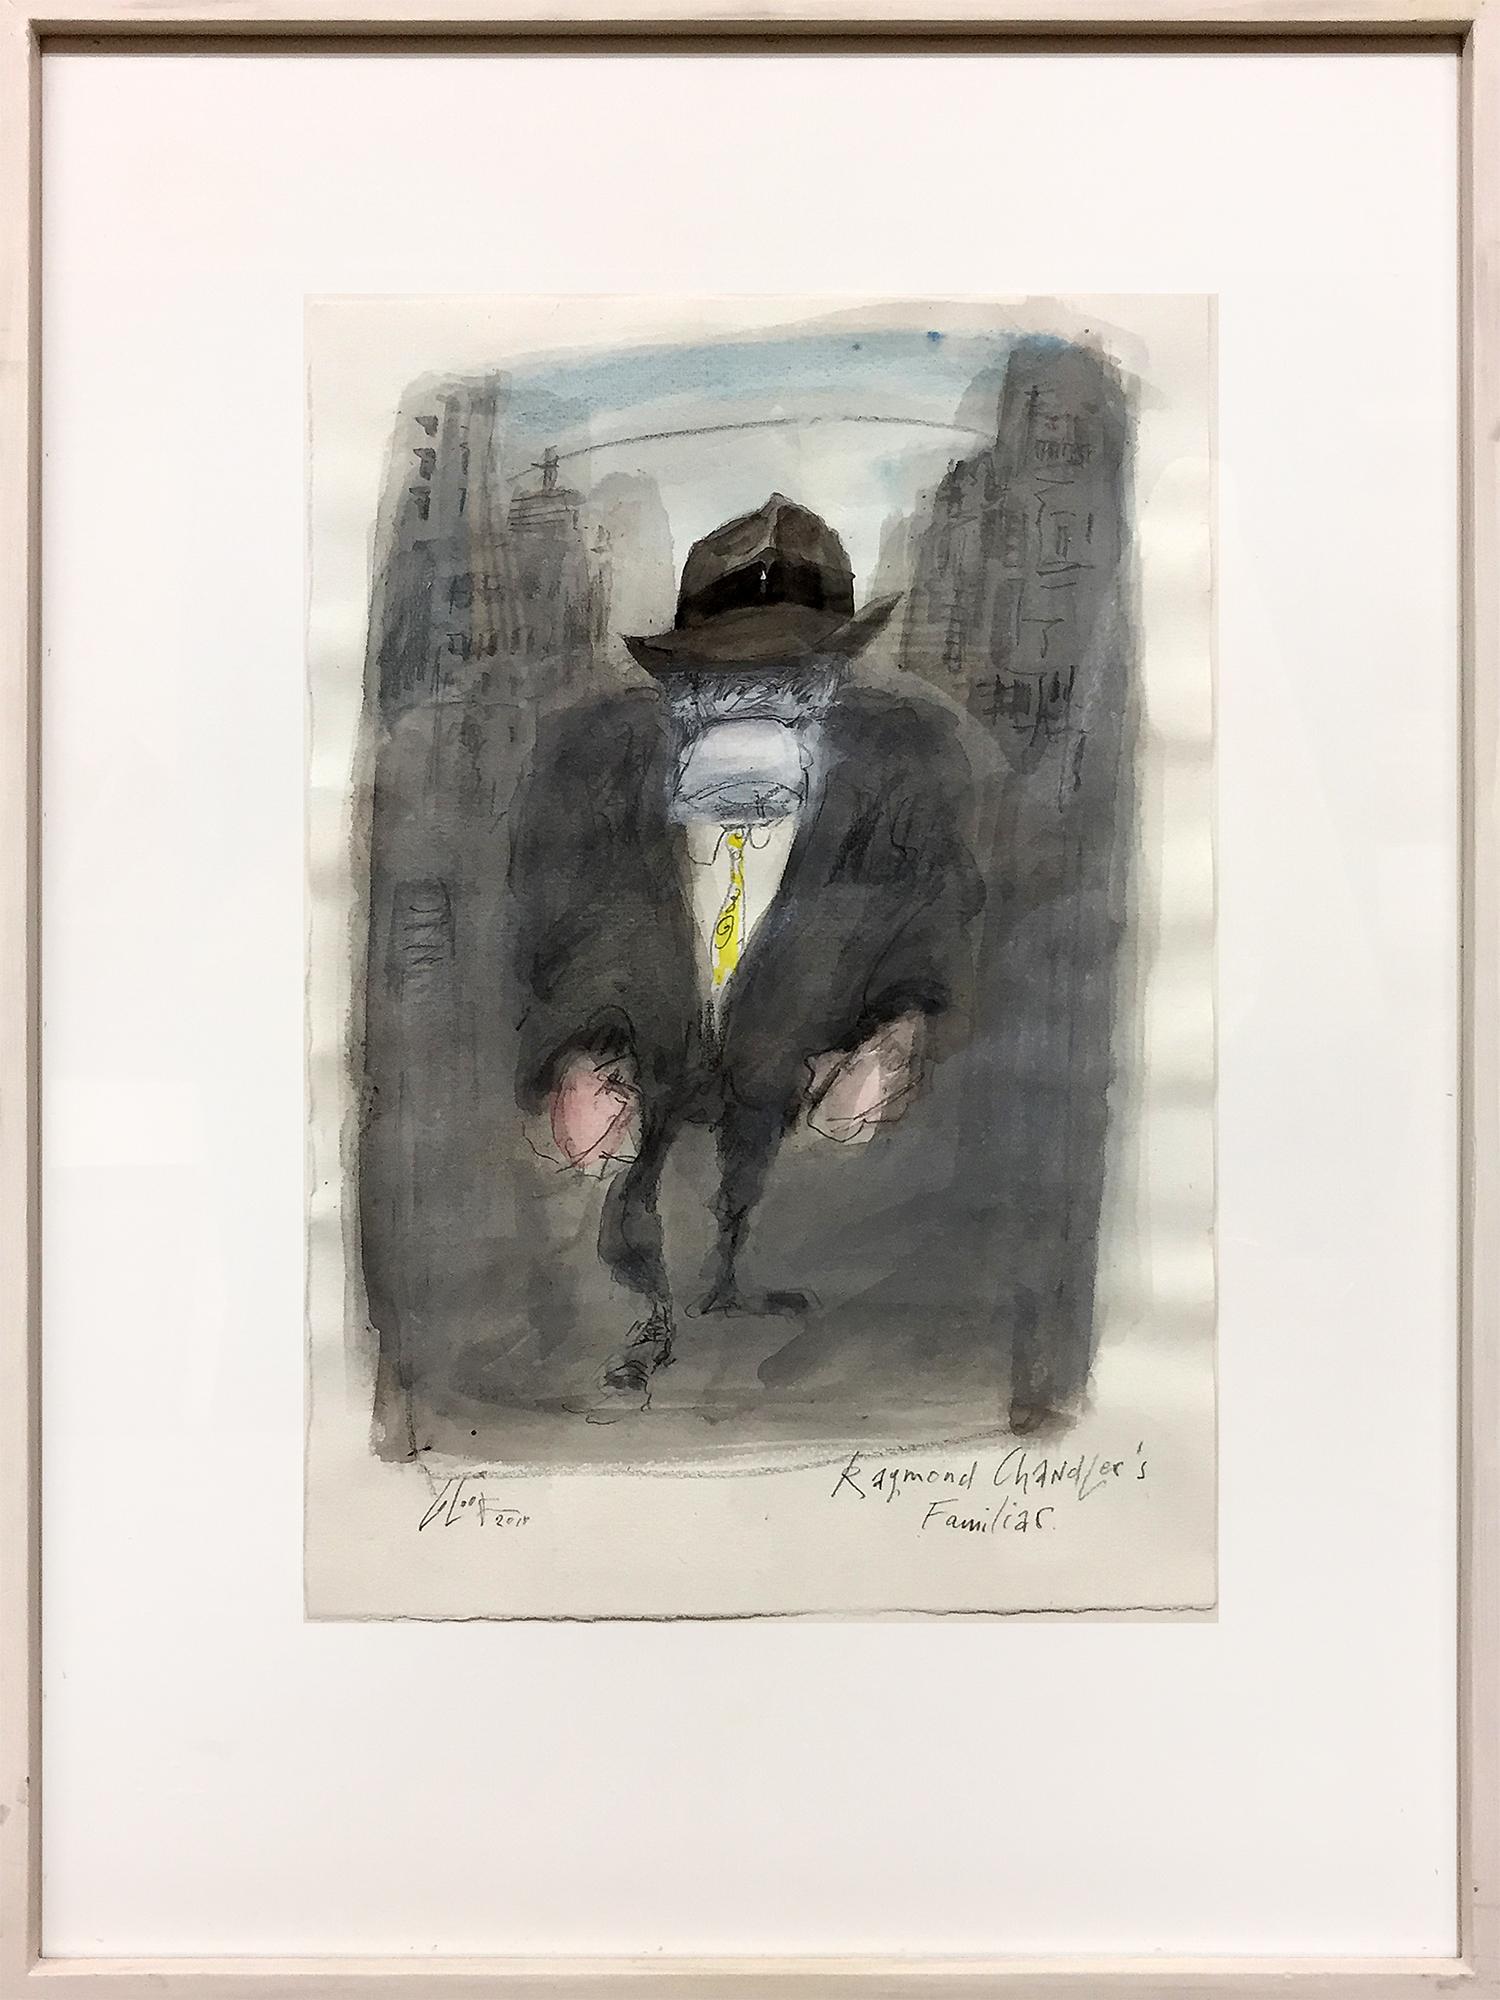 Raymond Chandler Familiar, 2010, Mischtechnik auf Büttenpapier, ca. 22 x 32 cm